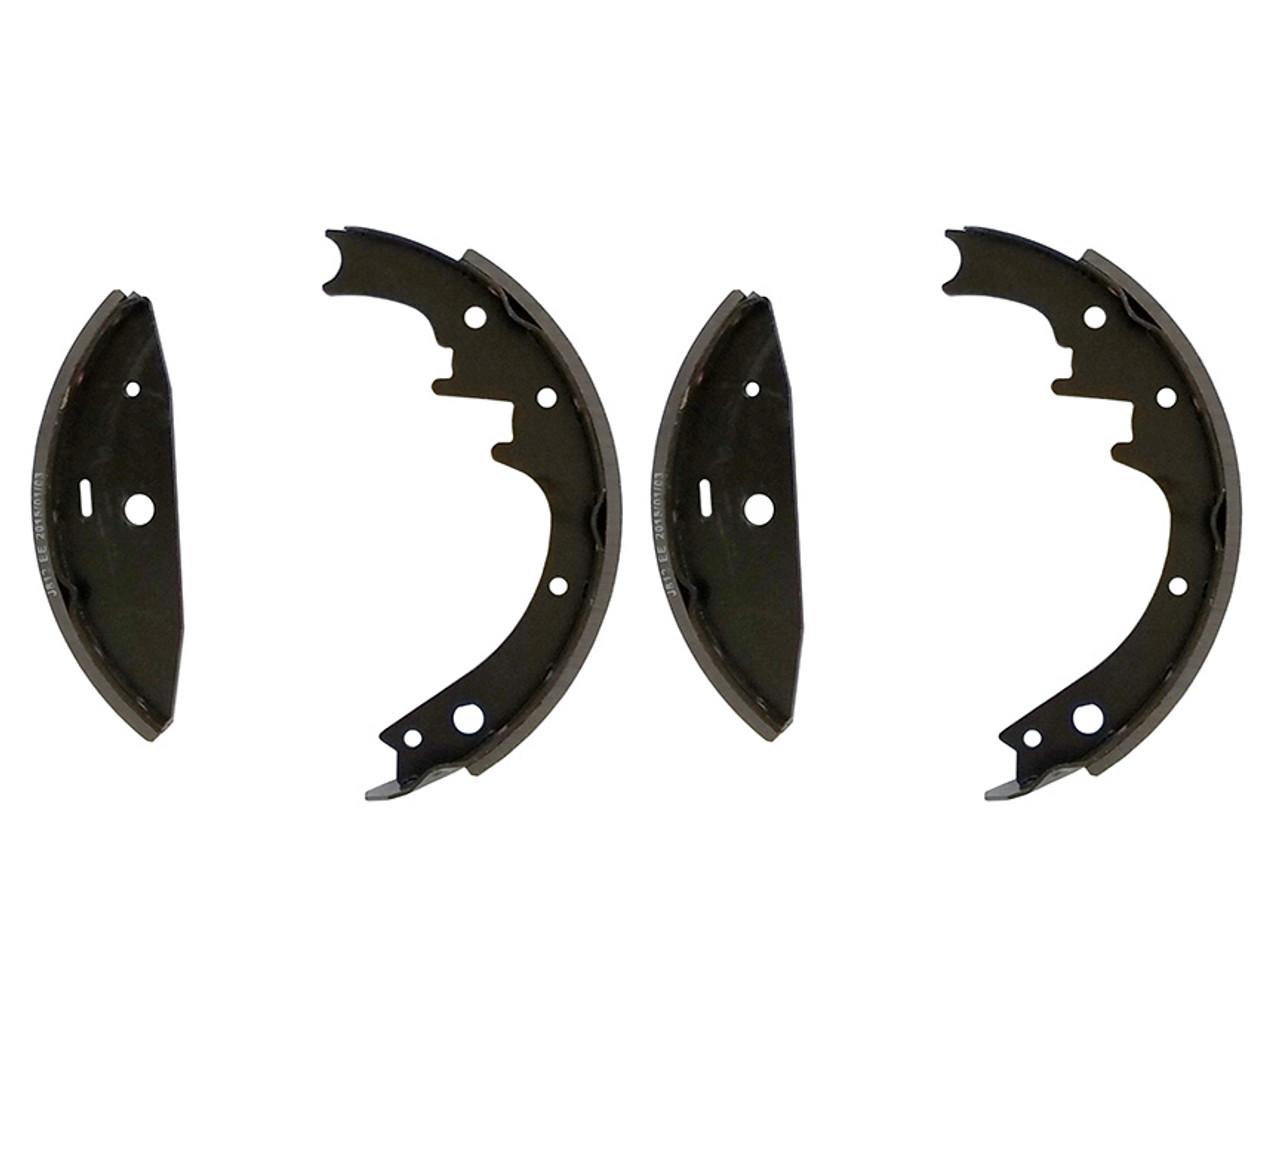 "7812 --- Shoe & Lining Kit for 10"" Hydraulic Free Backing Brakes"